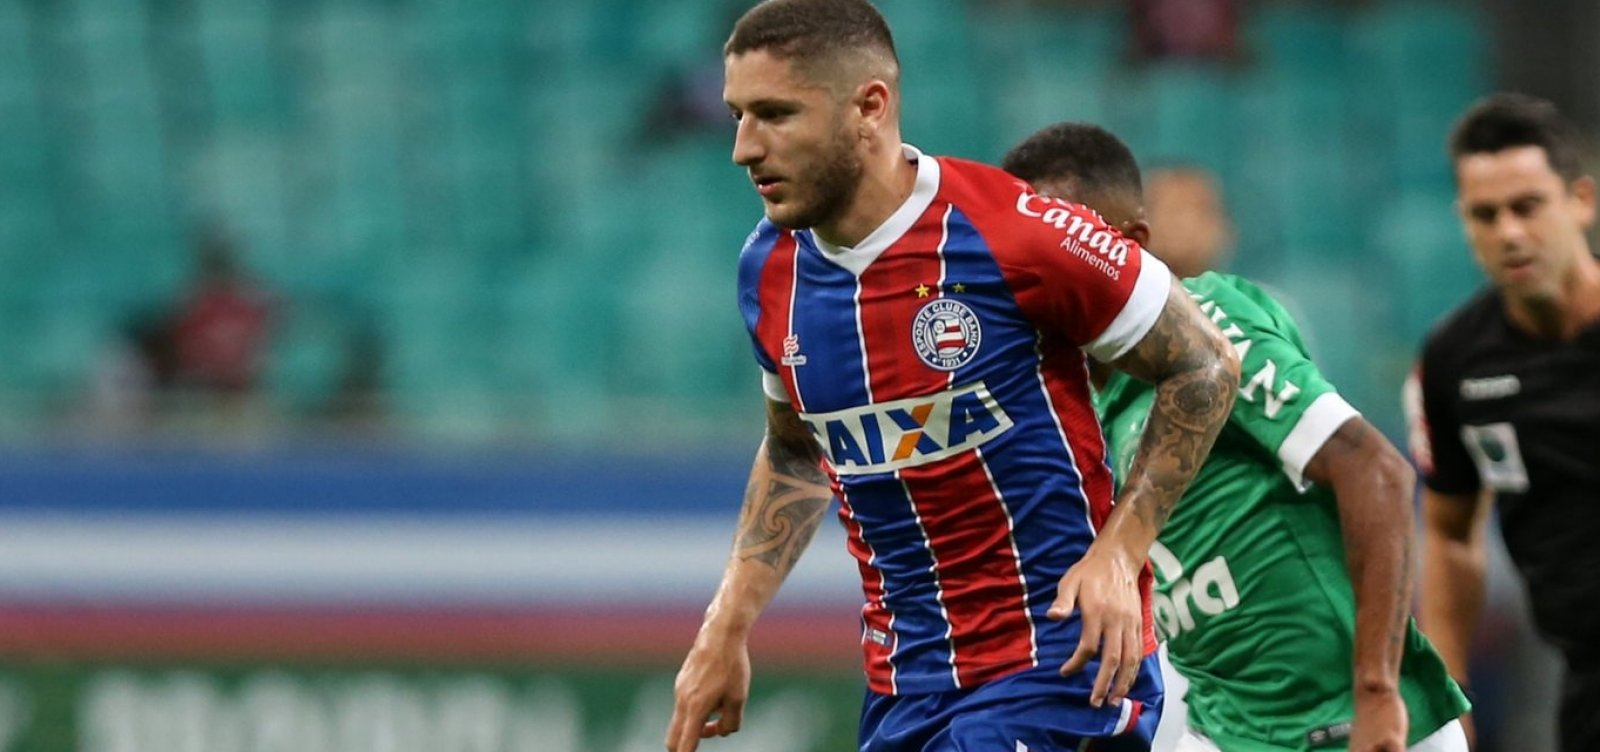 [Sem Zé Rafael, Bahia viaja para enfrentar o Atlético-MG]